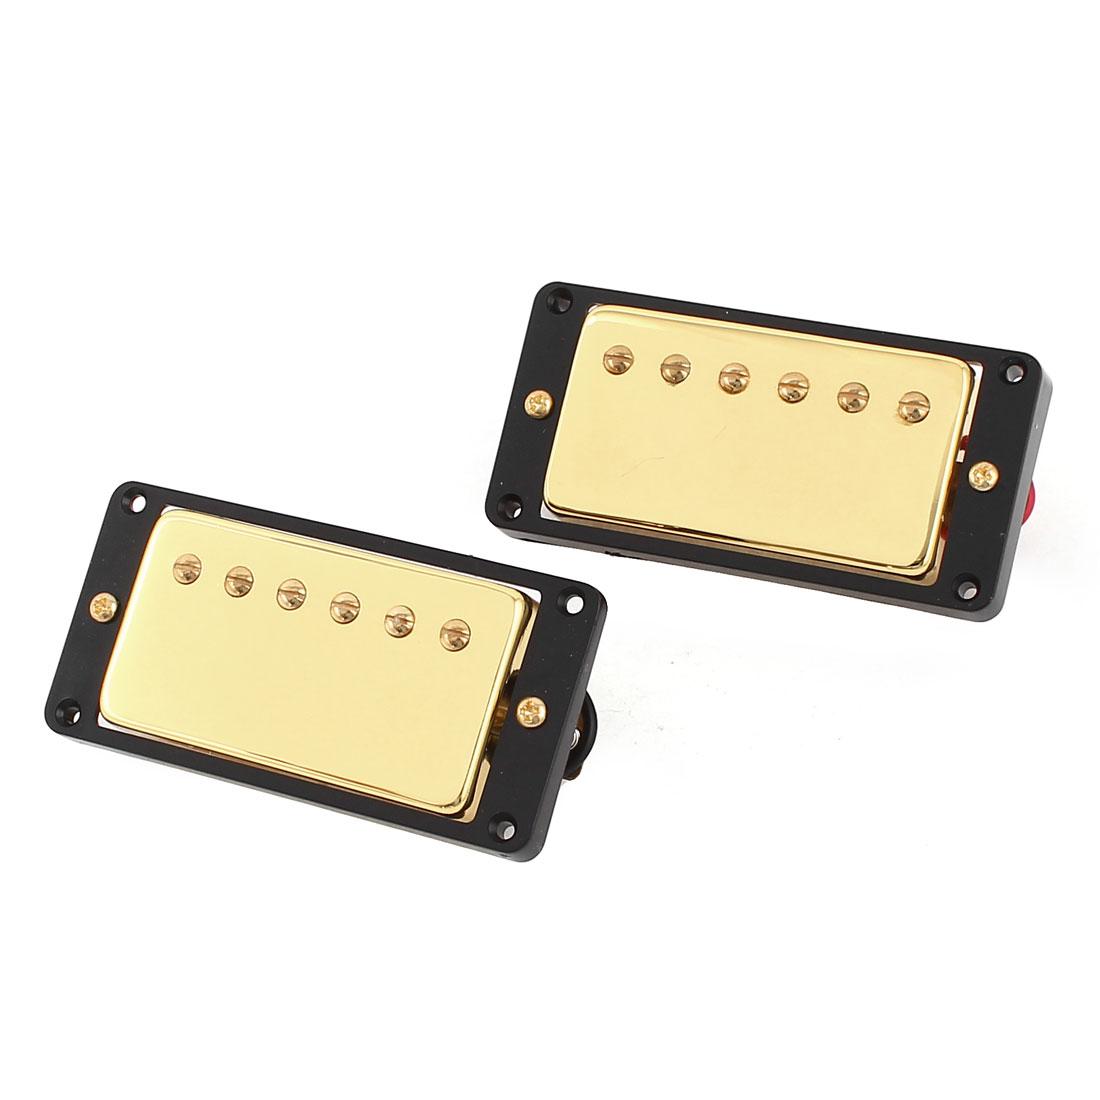 2 Pcs Electric Guitar LP Neck Bridge Pickups Black Gold Tone